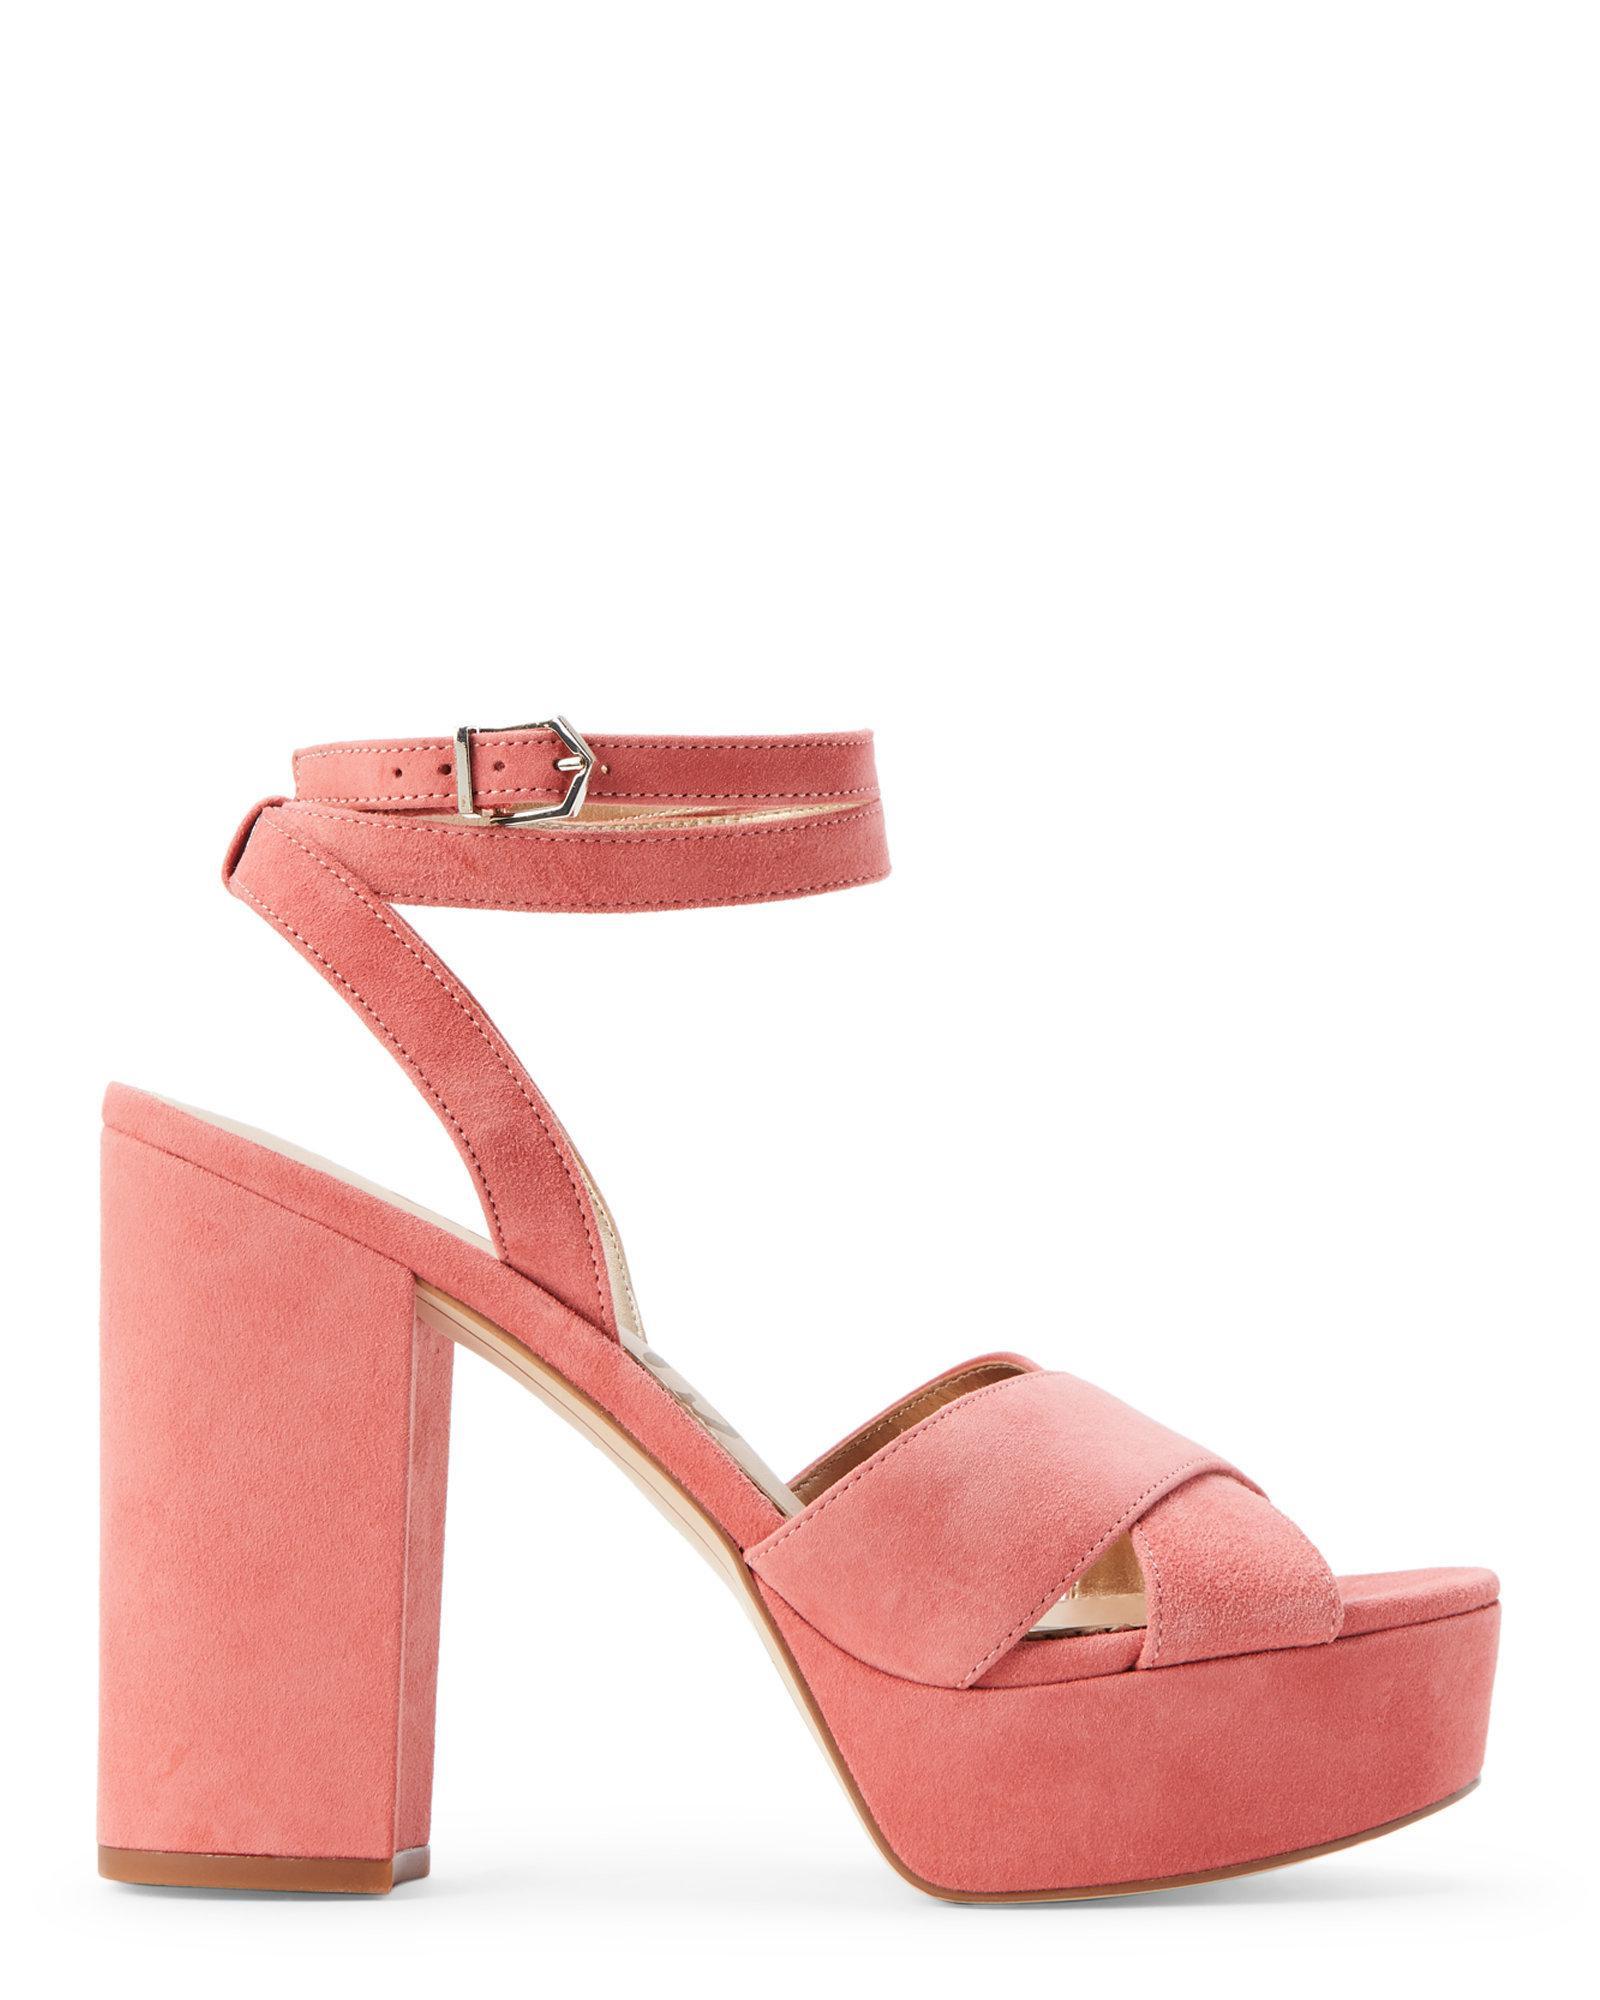 85920faa5 Lyst - Sam Edelman Washed Coral Mara Platform Block Heel Sandals in Pink